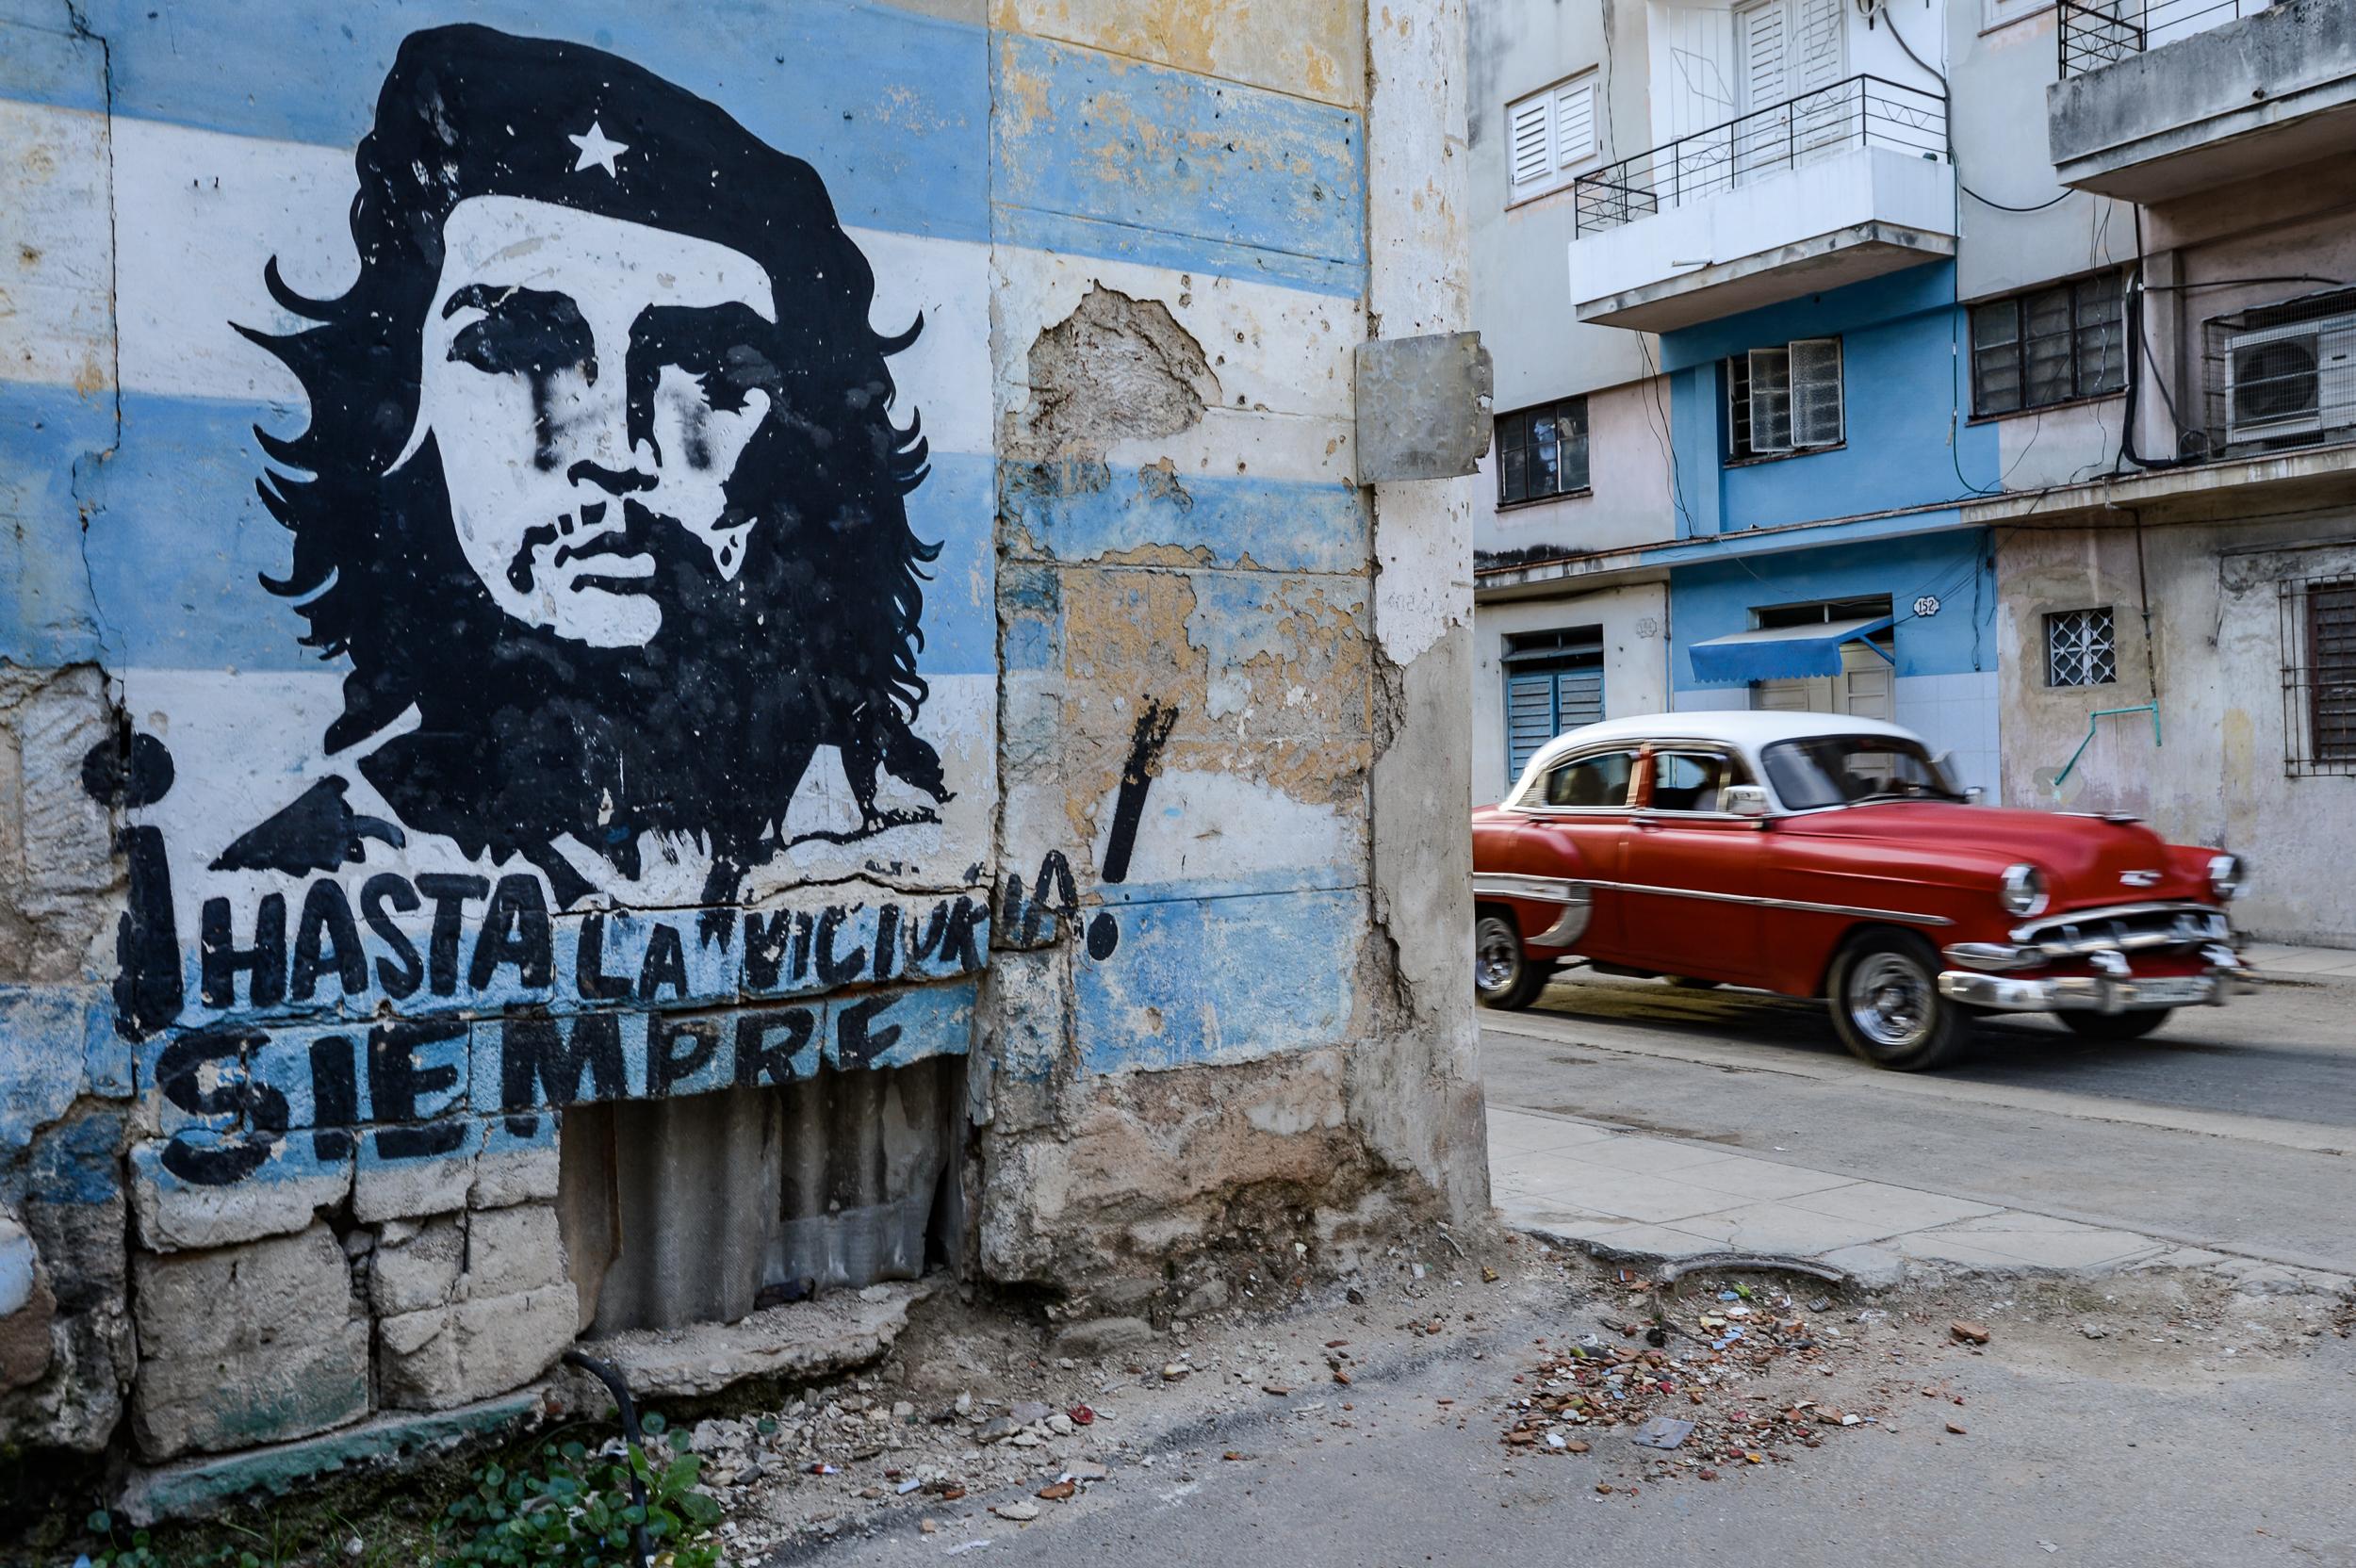 Havana, Cuba - FEBRUARY 2020